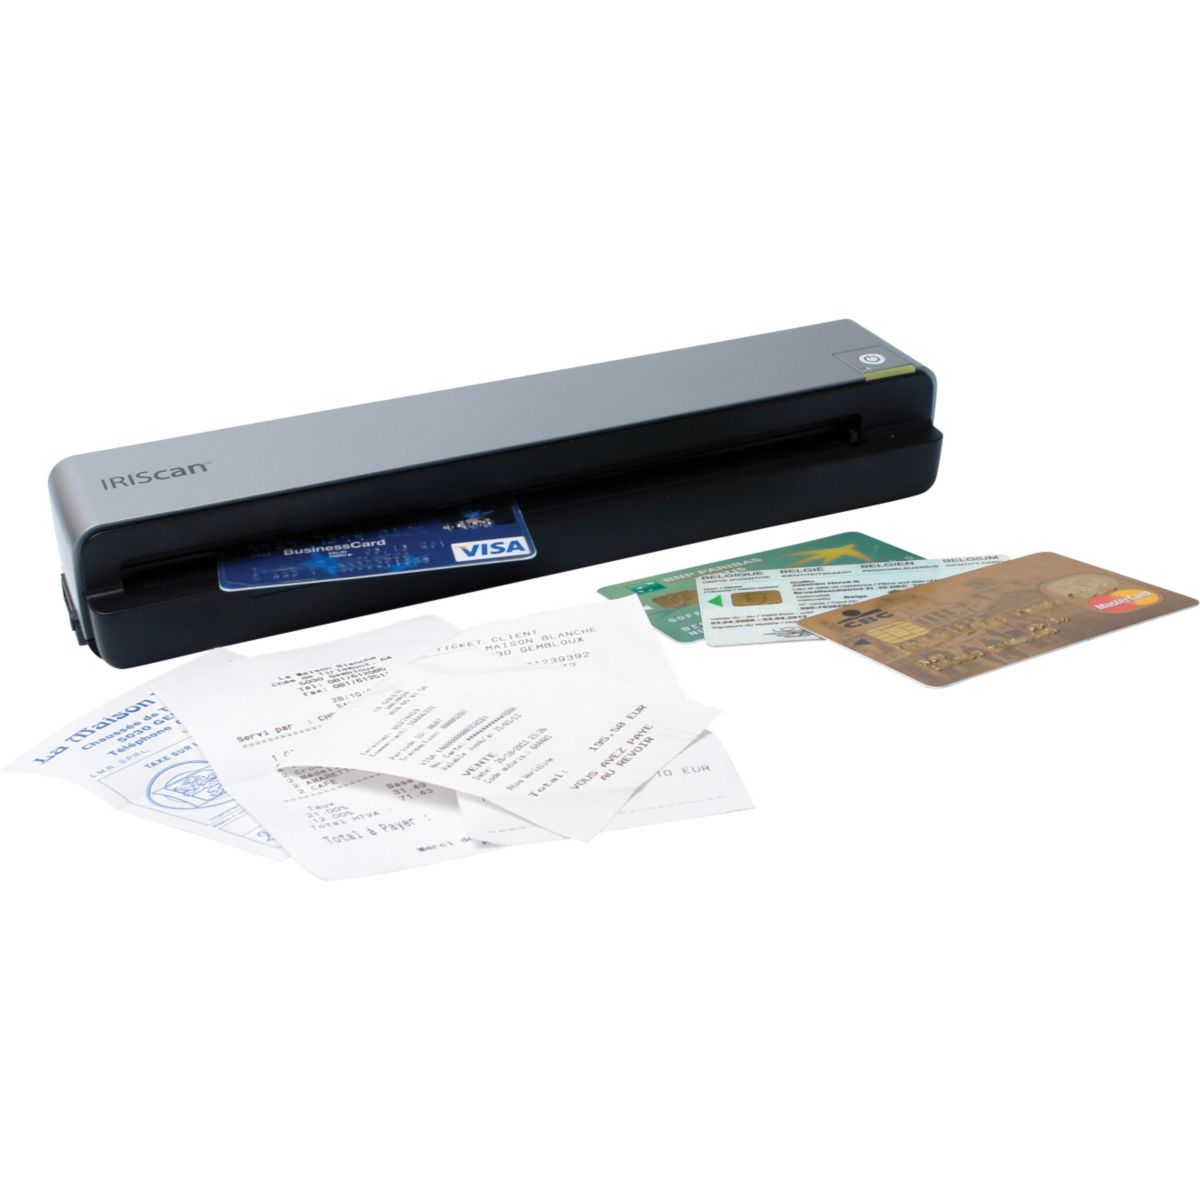 Scanner portable iris anywhere 3 - 15% de remise immédiate avec le code : cool15 (photo)